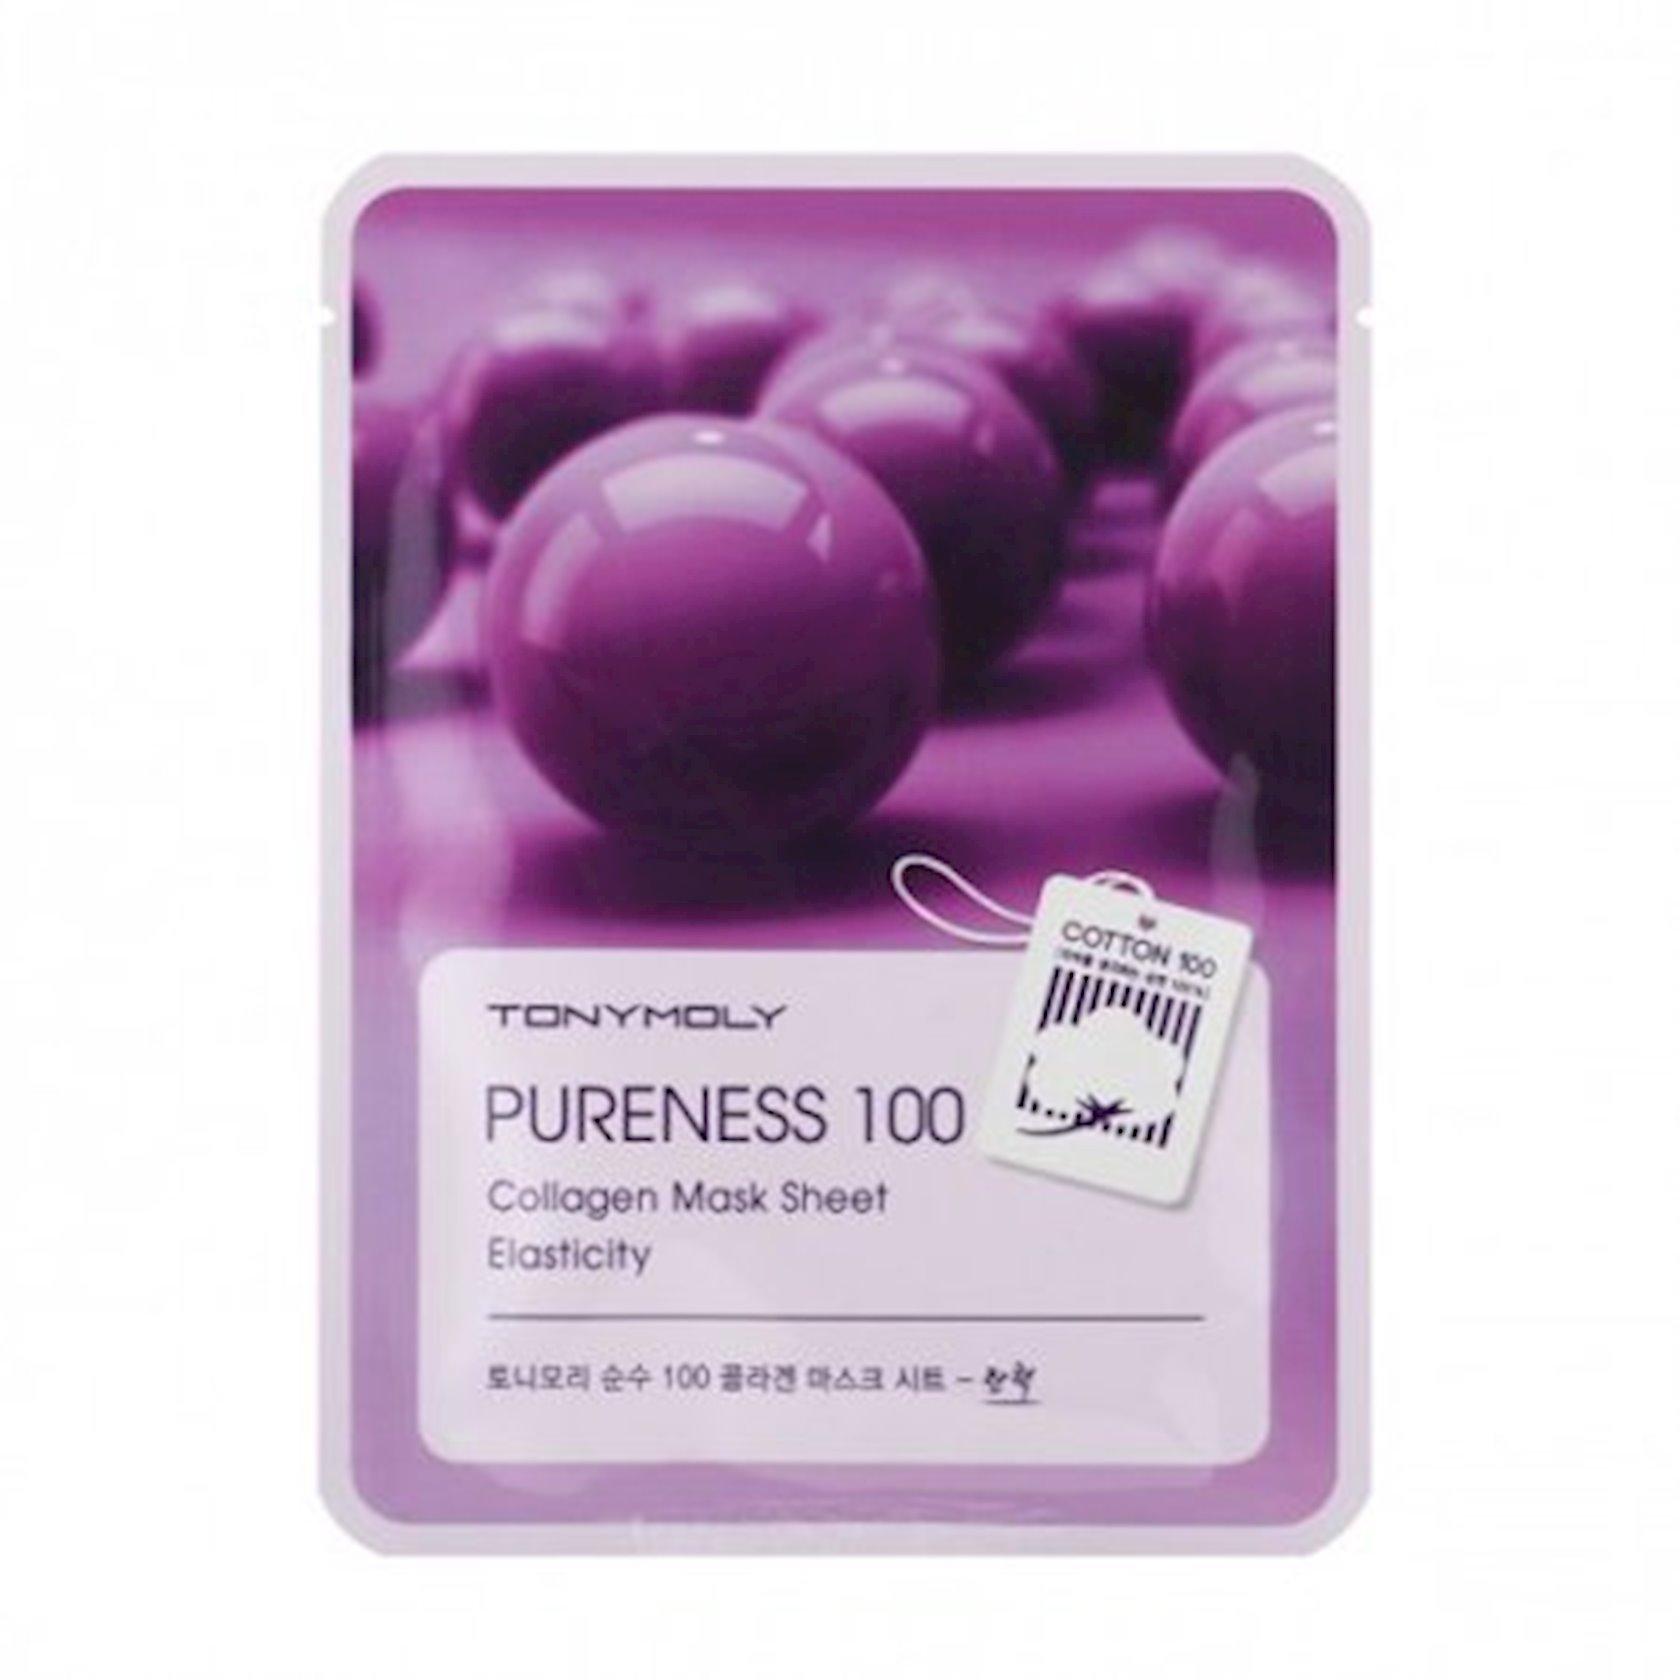 Parça maska Tony Moly Pureness 100 Collagen Mask Sheet